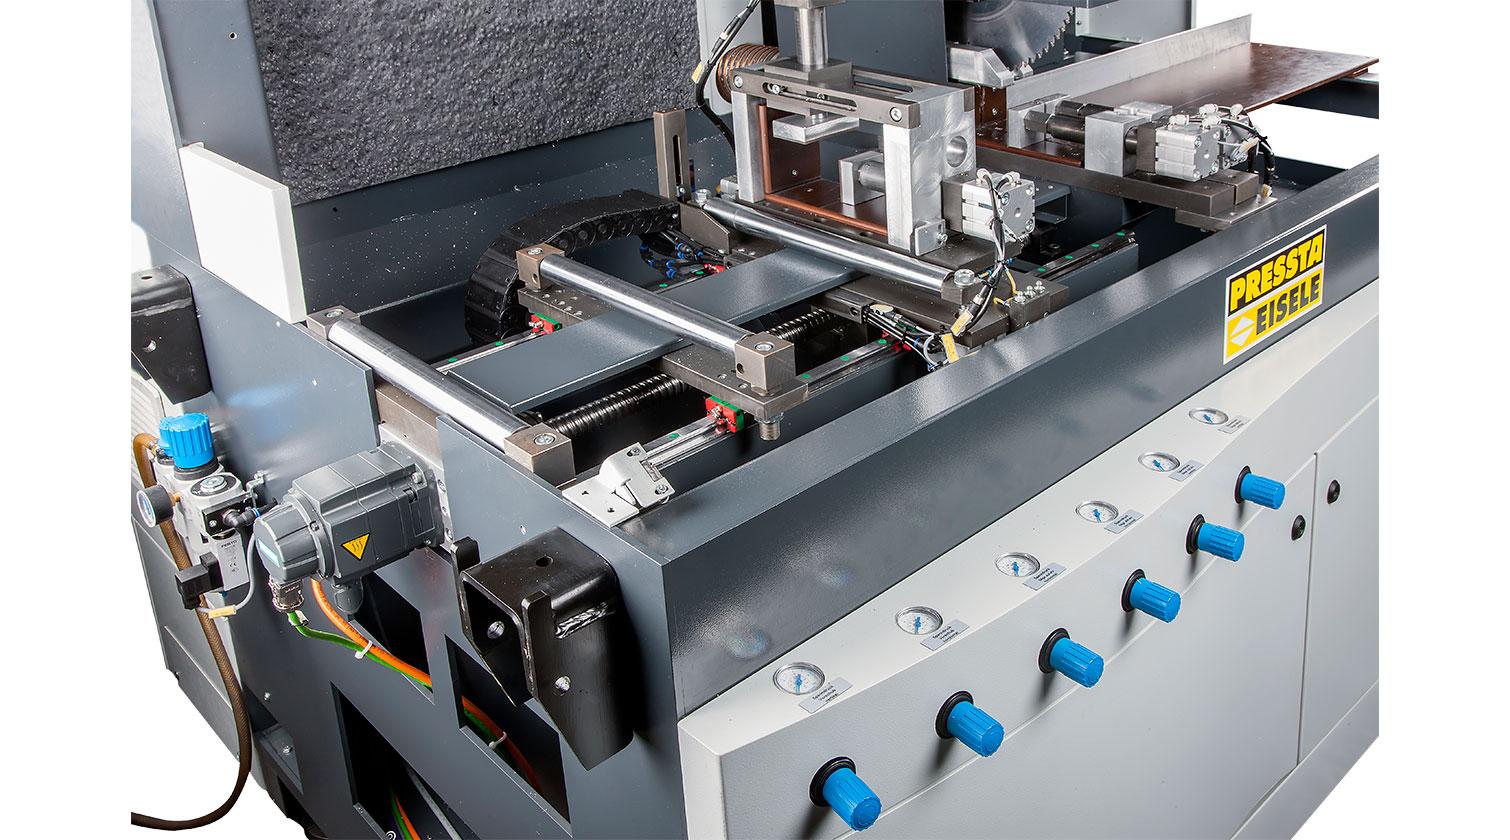 INT aluminum automatic saw Pressta Eisele Profilma 400 V feeding mechanism